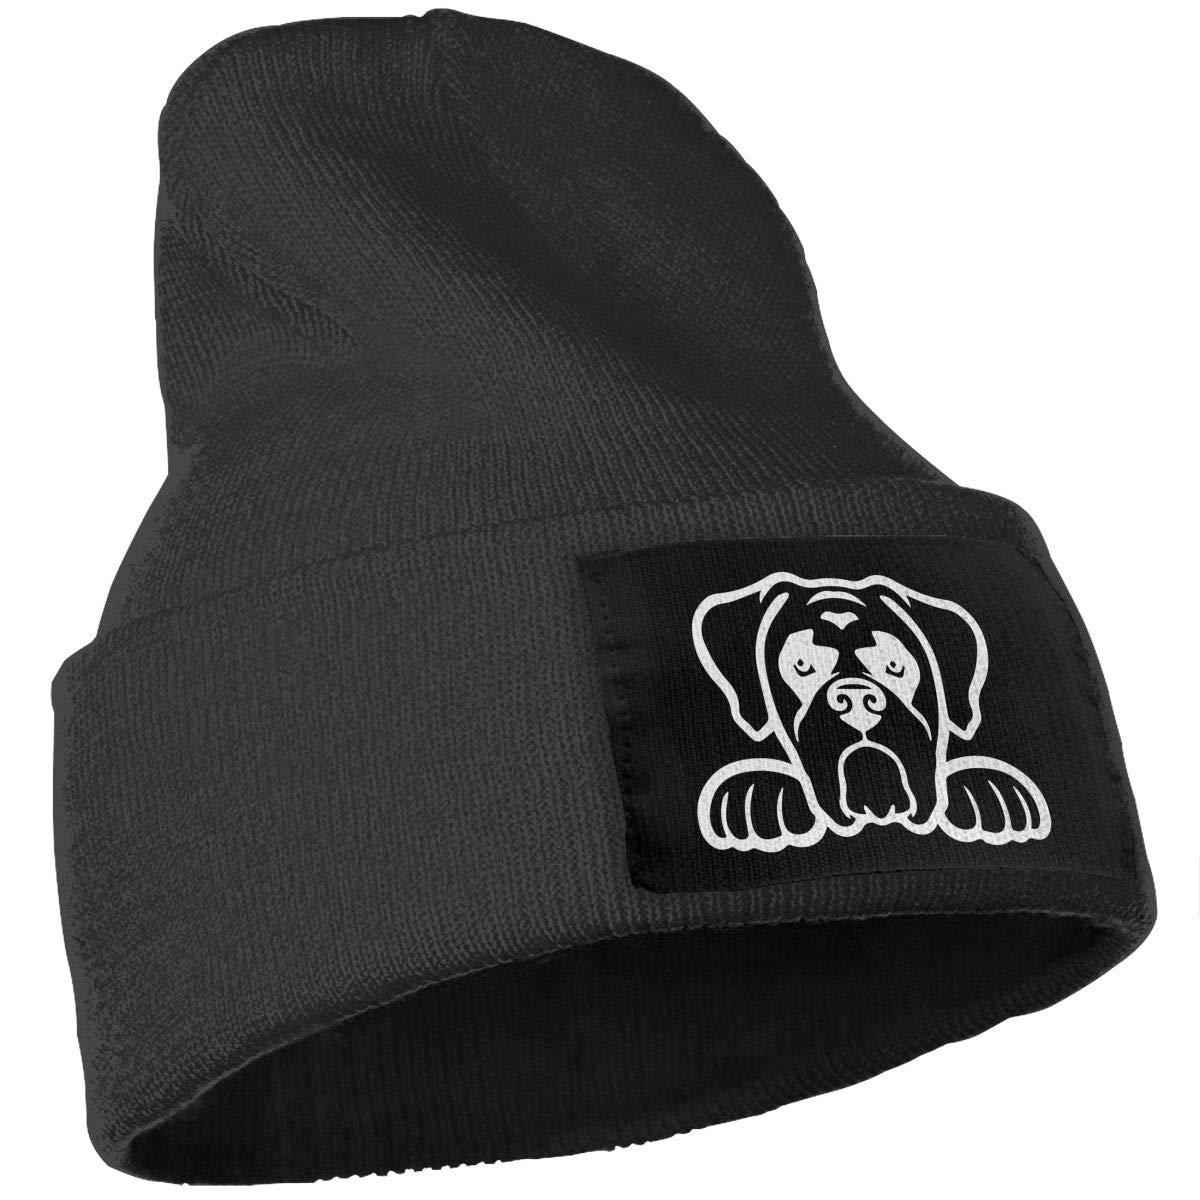 COLLJL-8 Men /& Women Boxer Dog Peeking Outdoor Warm Knit Beanies Hat Soft Winter Skull Caps